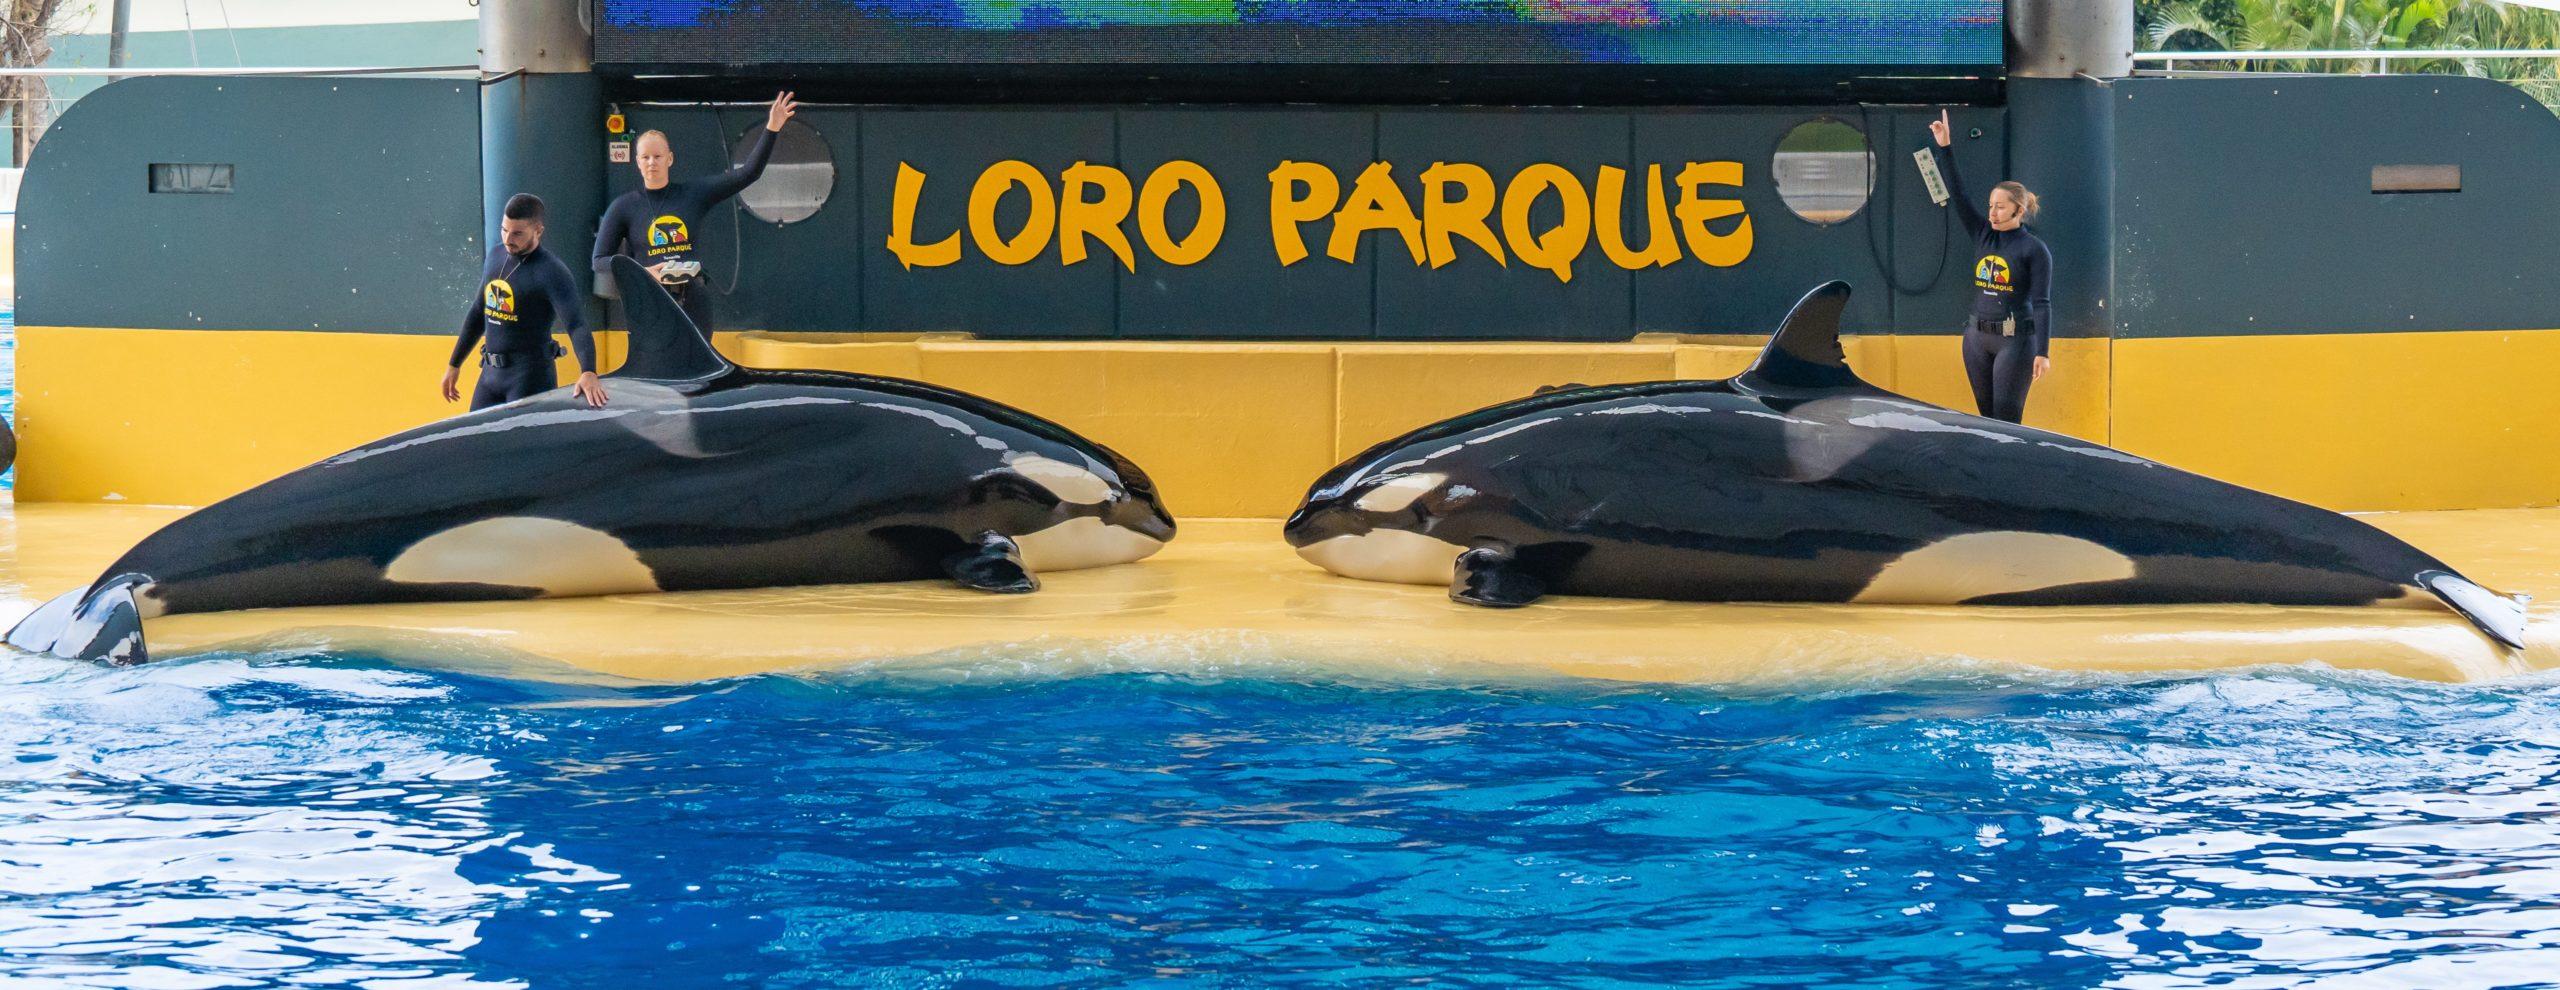 Atlantik, Teneriffa, La Orotava, im Loro Parque, Orca-Zucht (Killerwale)